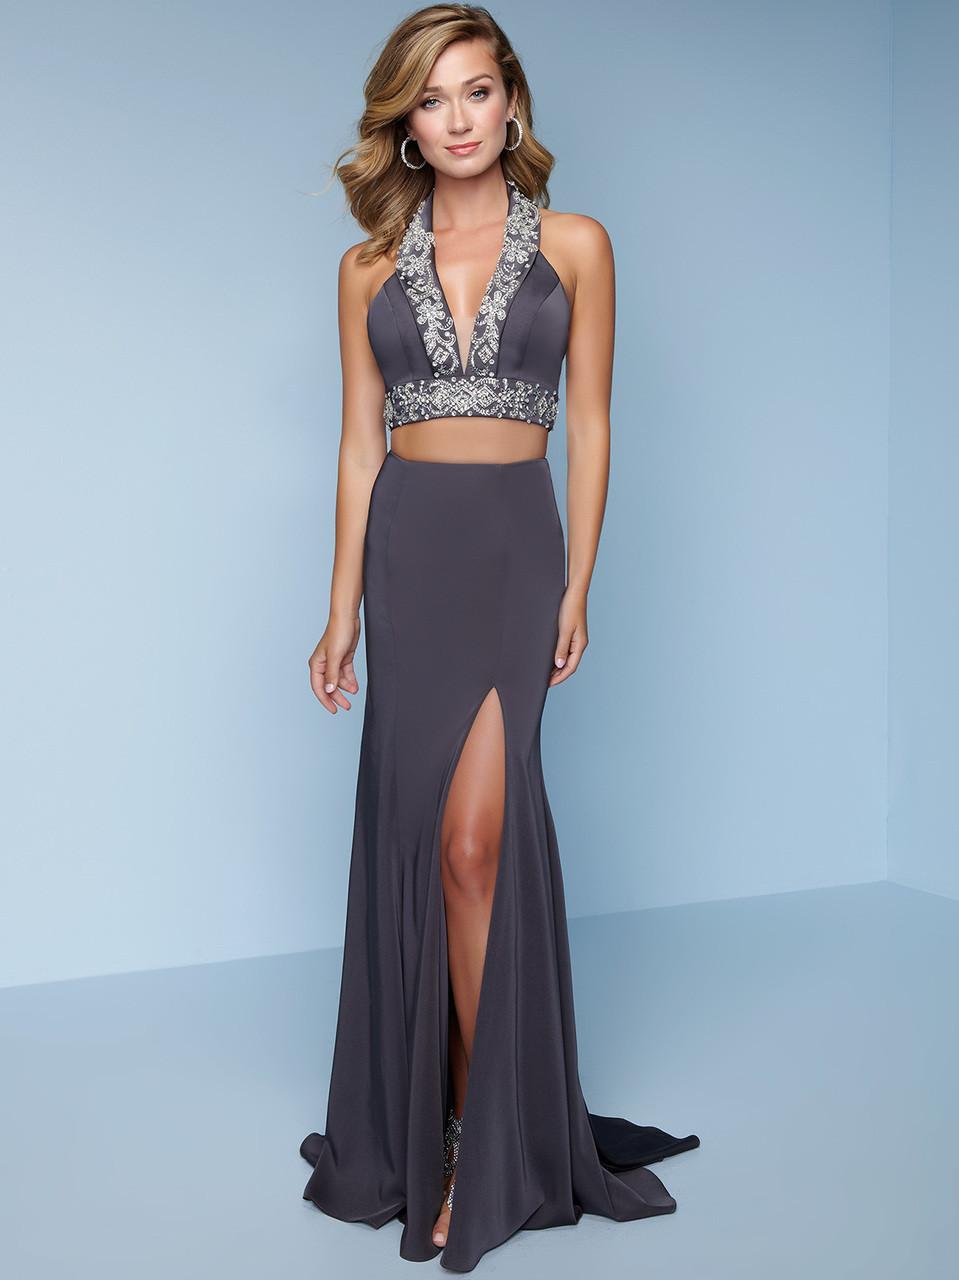 7ddf40a5b3 Two-Piece High Slit Splash Prom Dress K132   PromHeadquarters.com